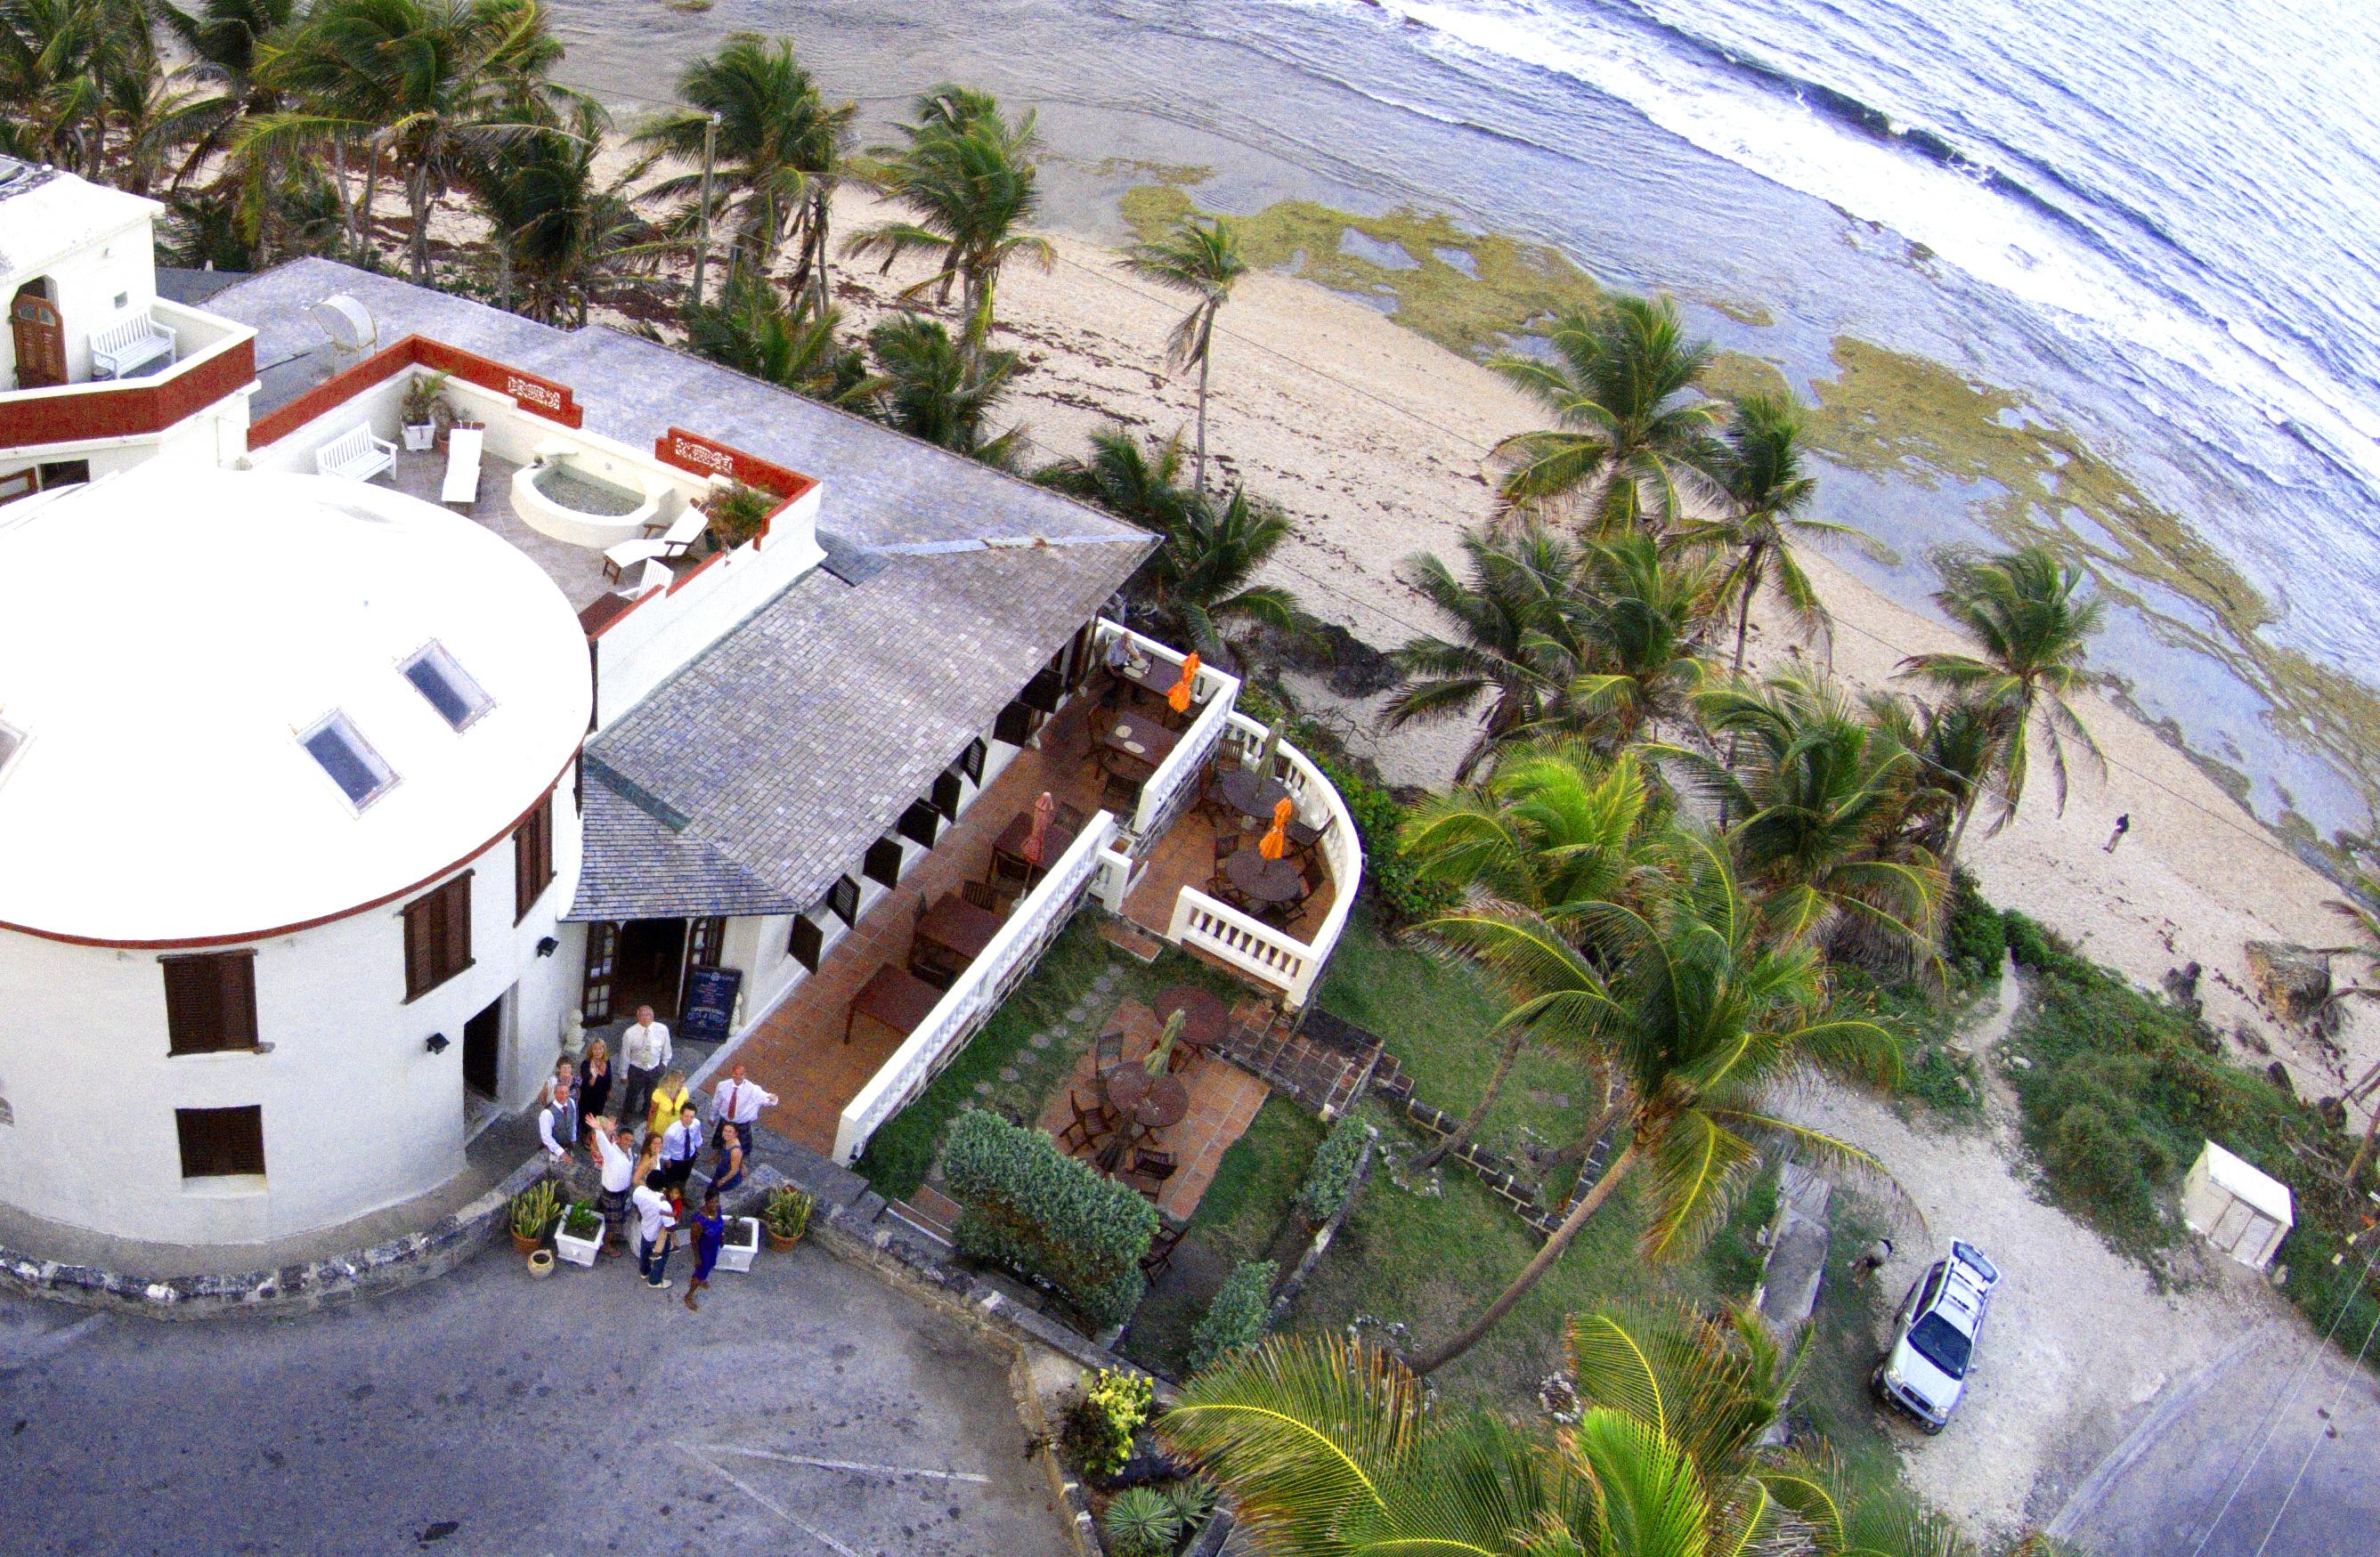 surfholidays: round house, east coast & bathsheba